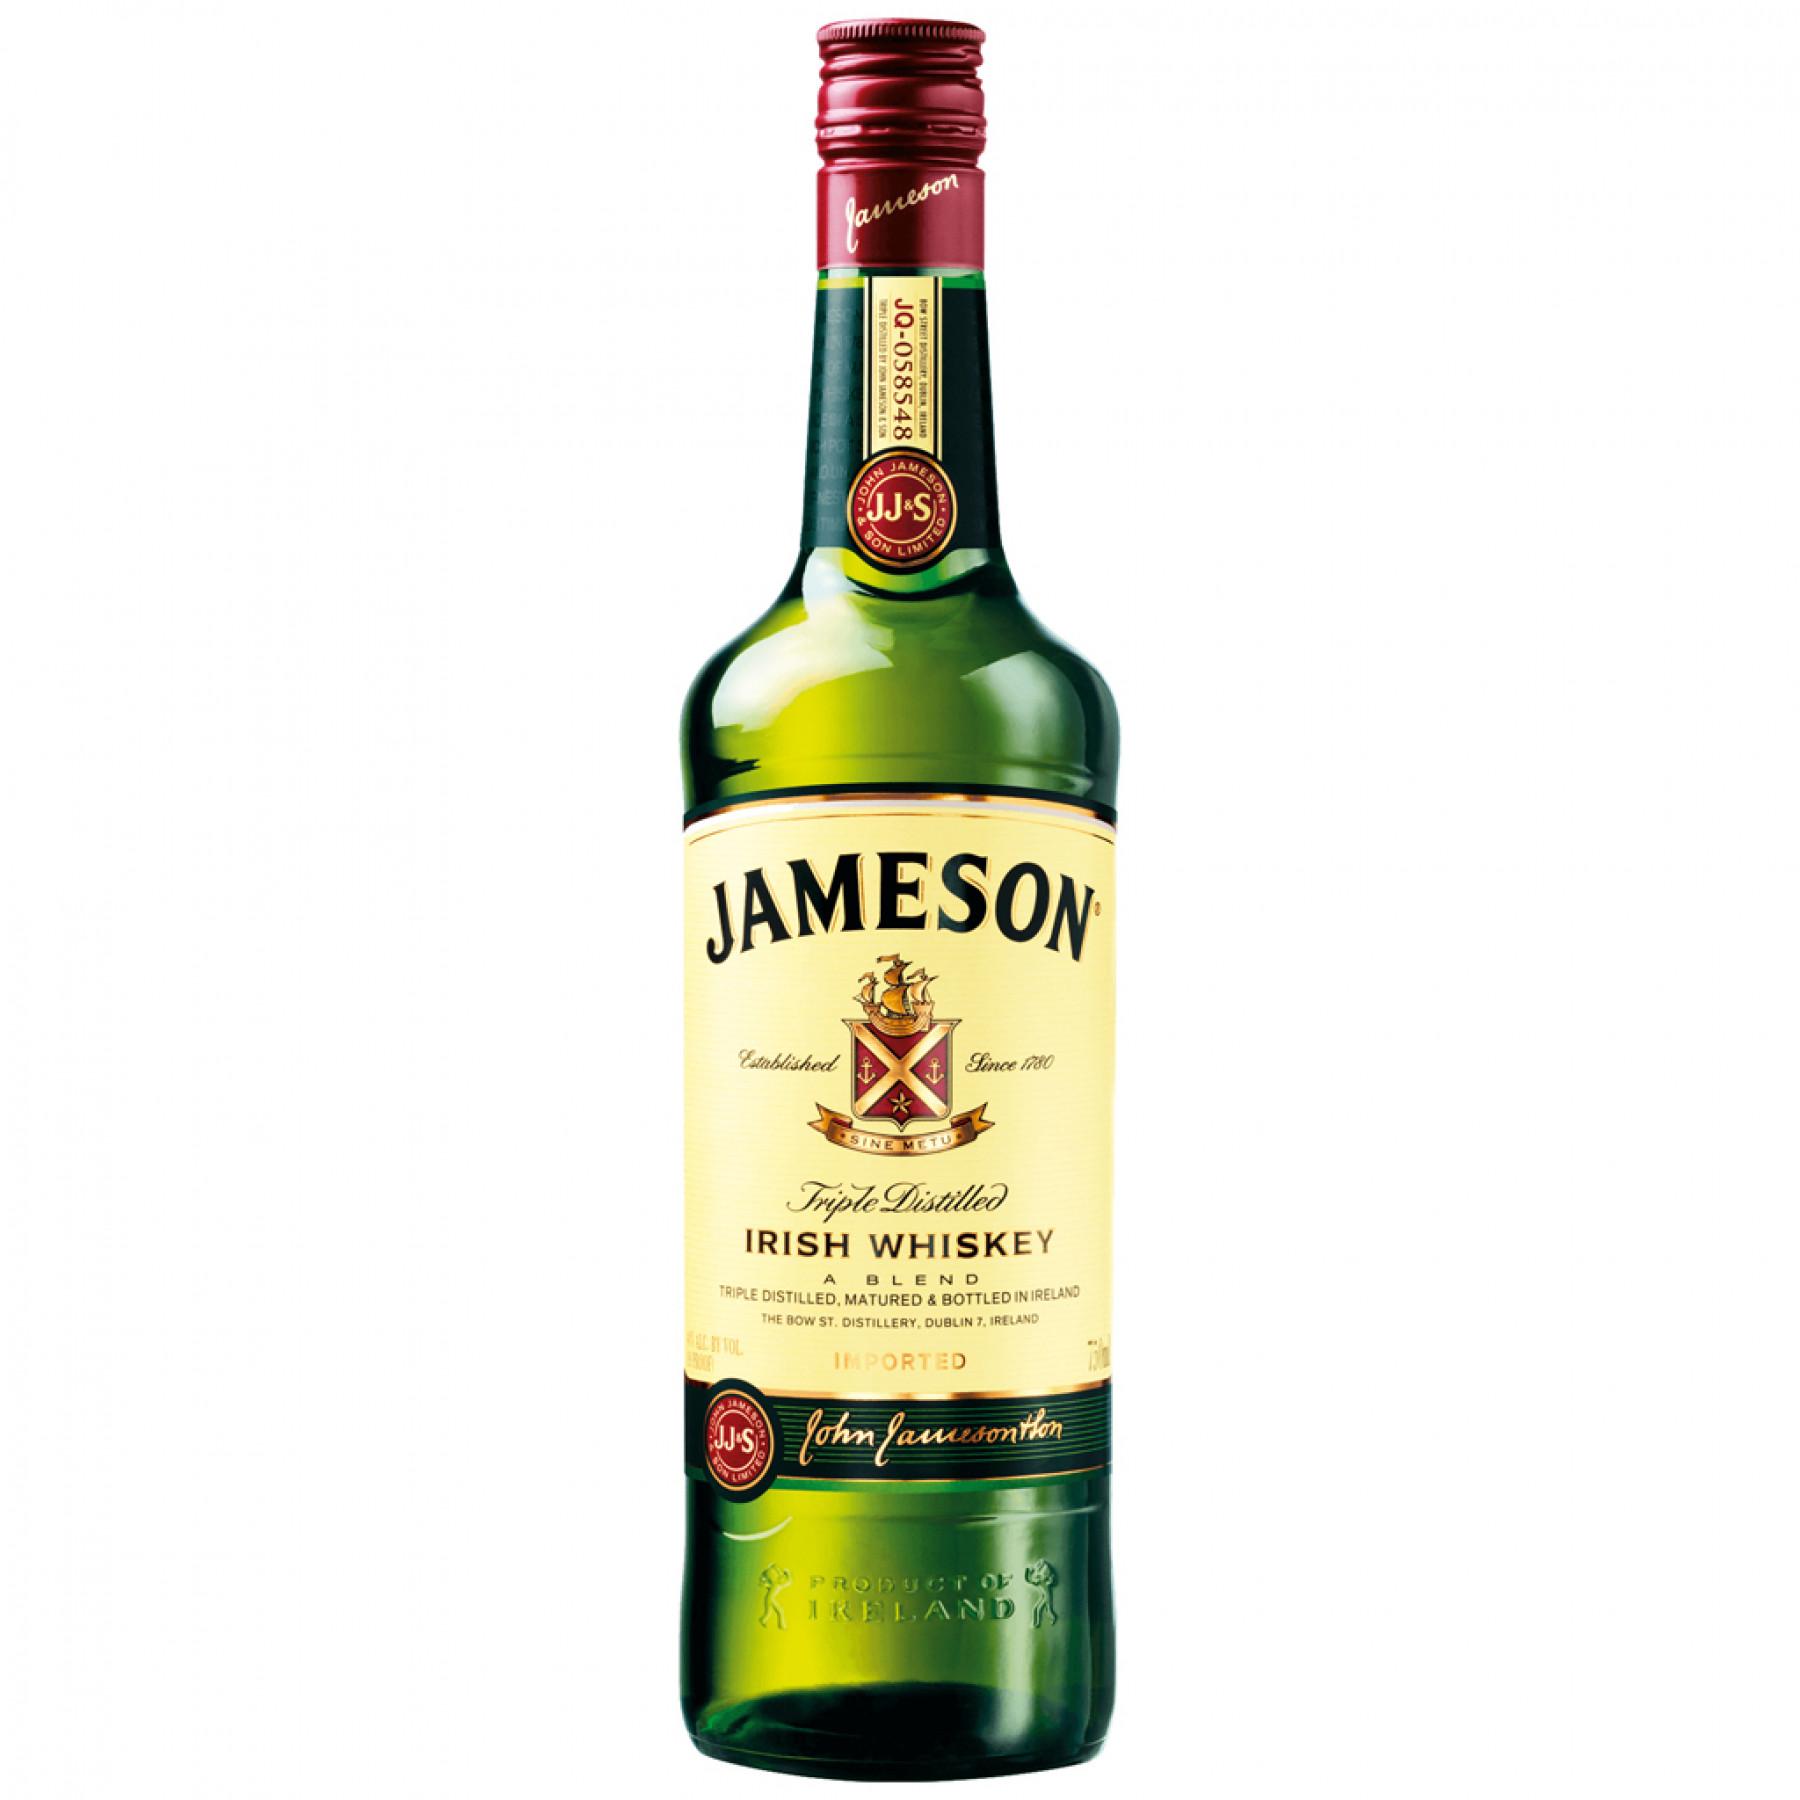 Jameson Blended Irish Whiskey - 750ML